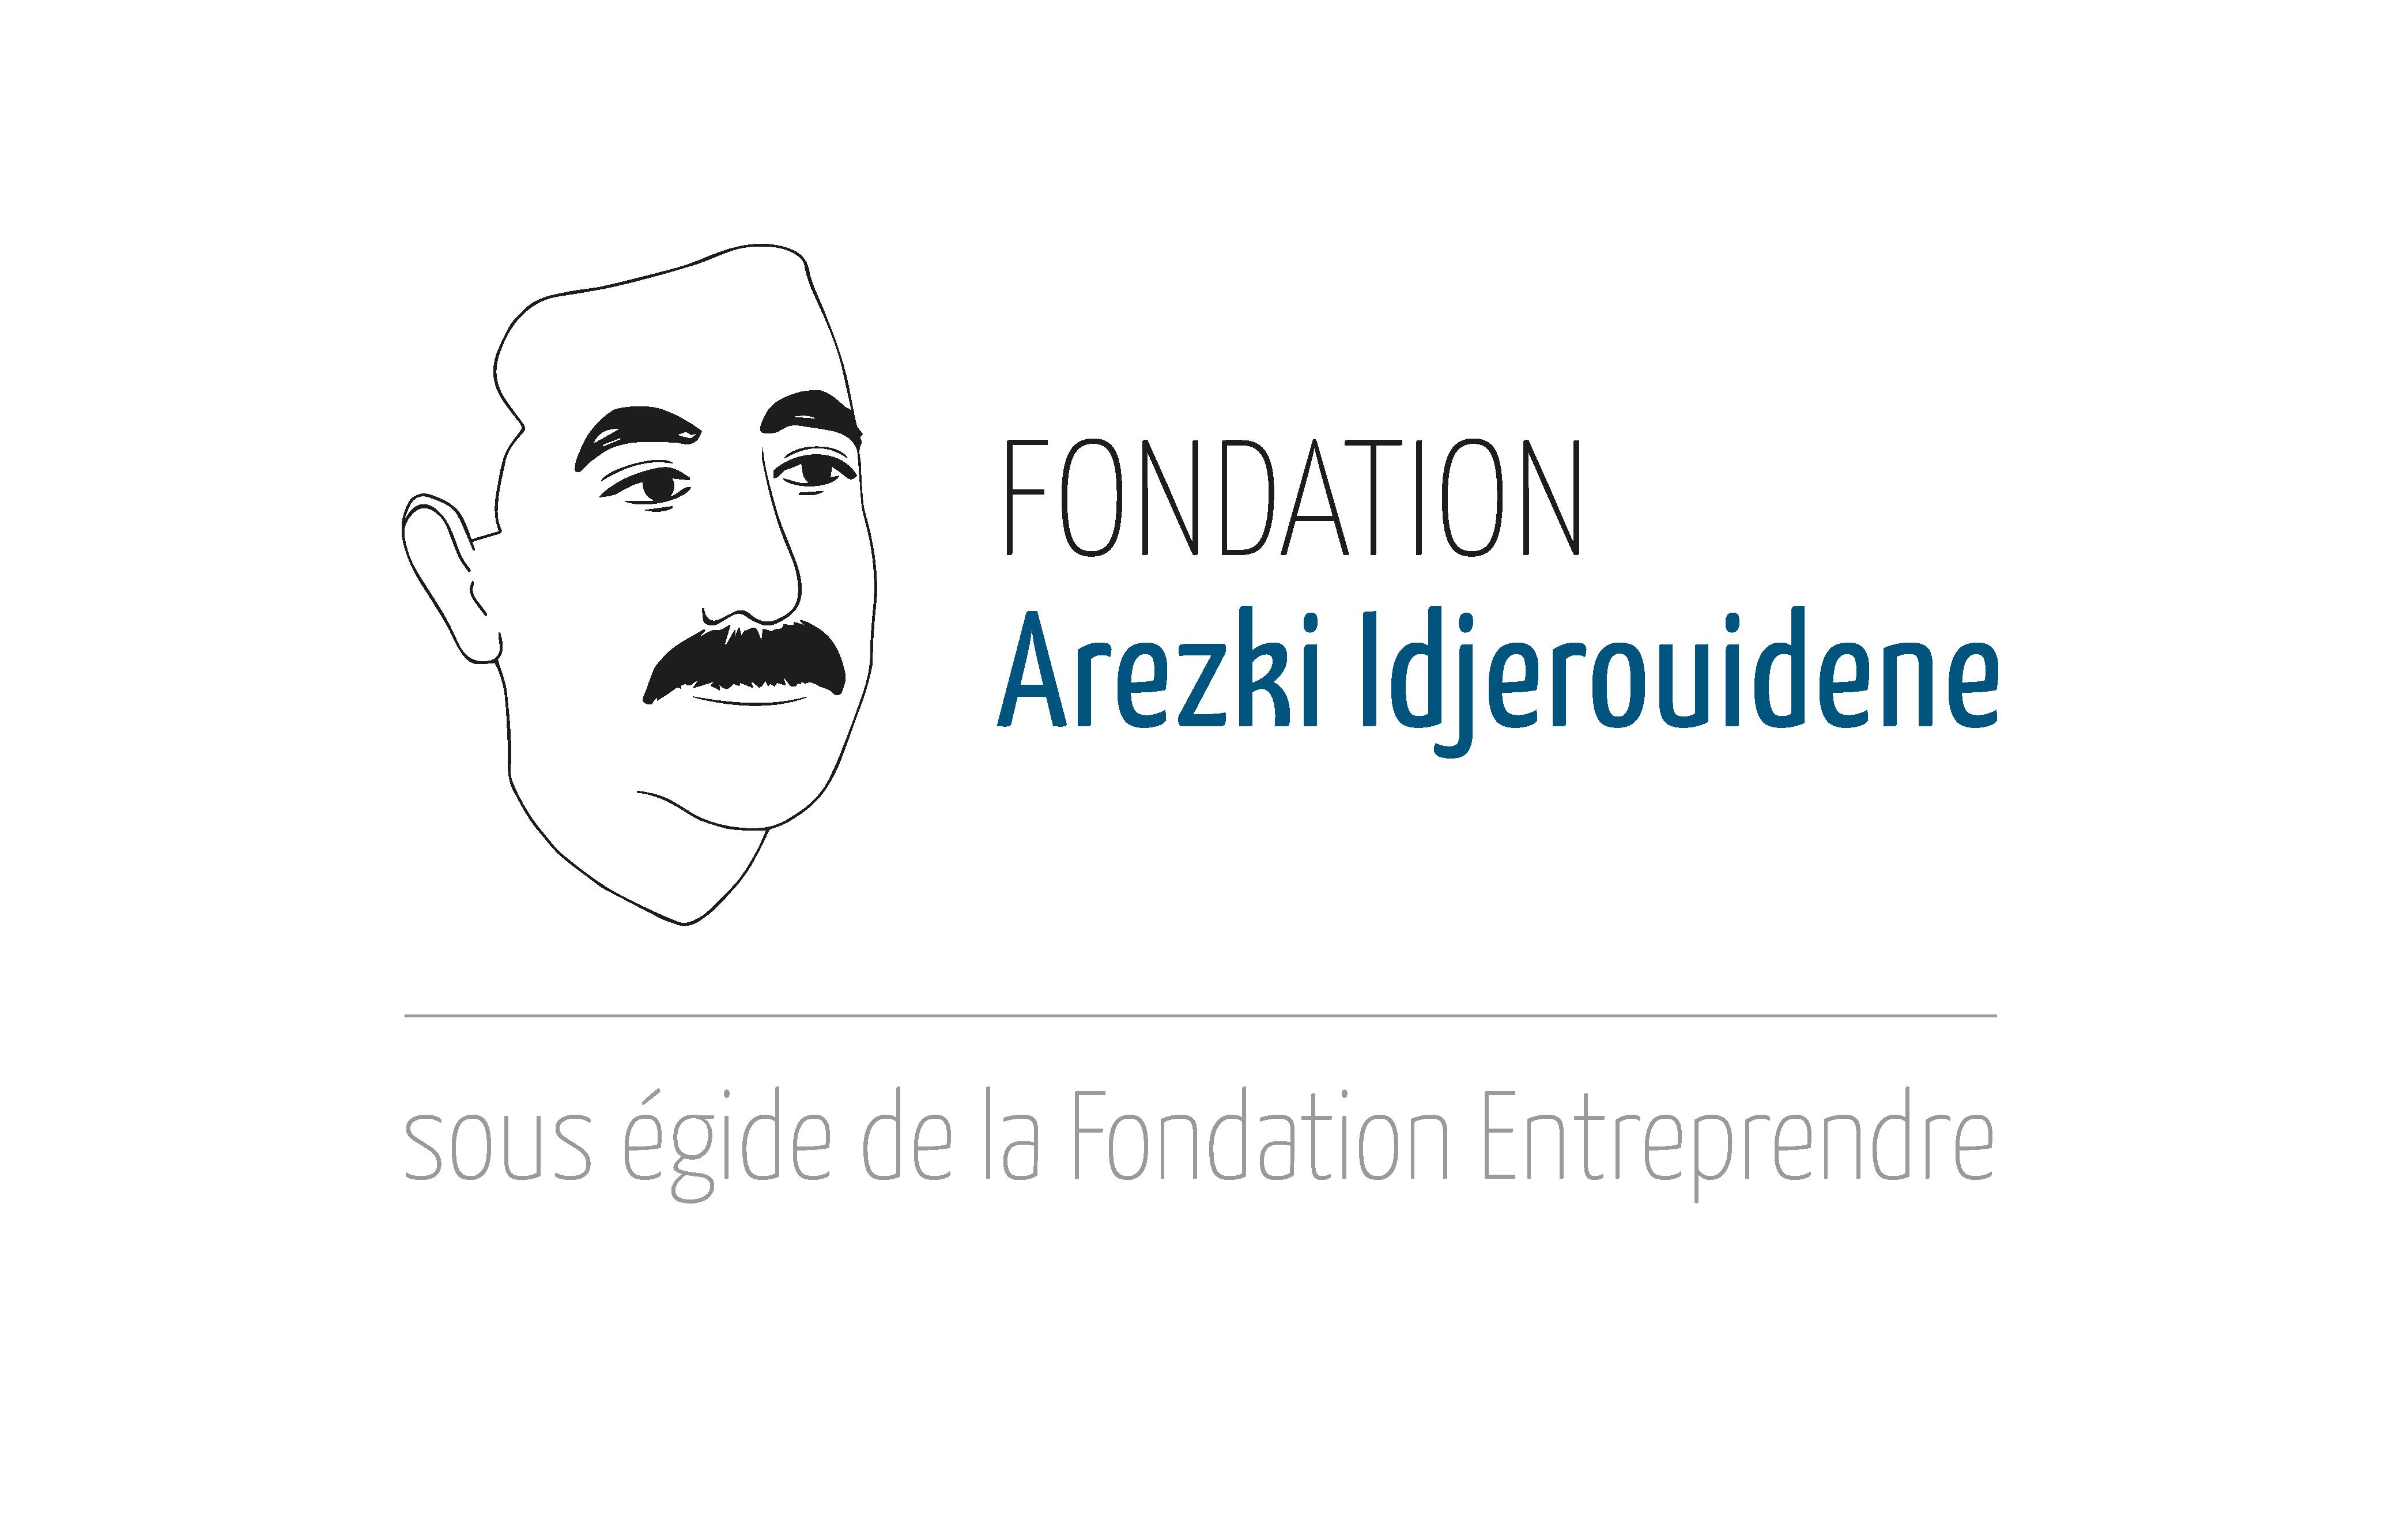 Fondation Arezki Idjerouidene